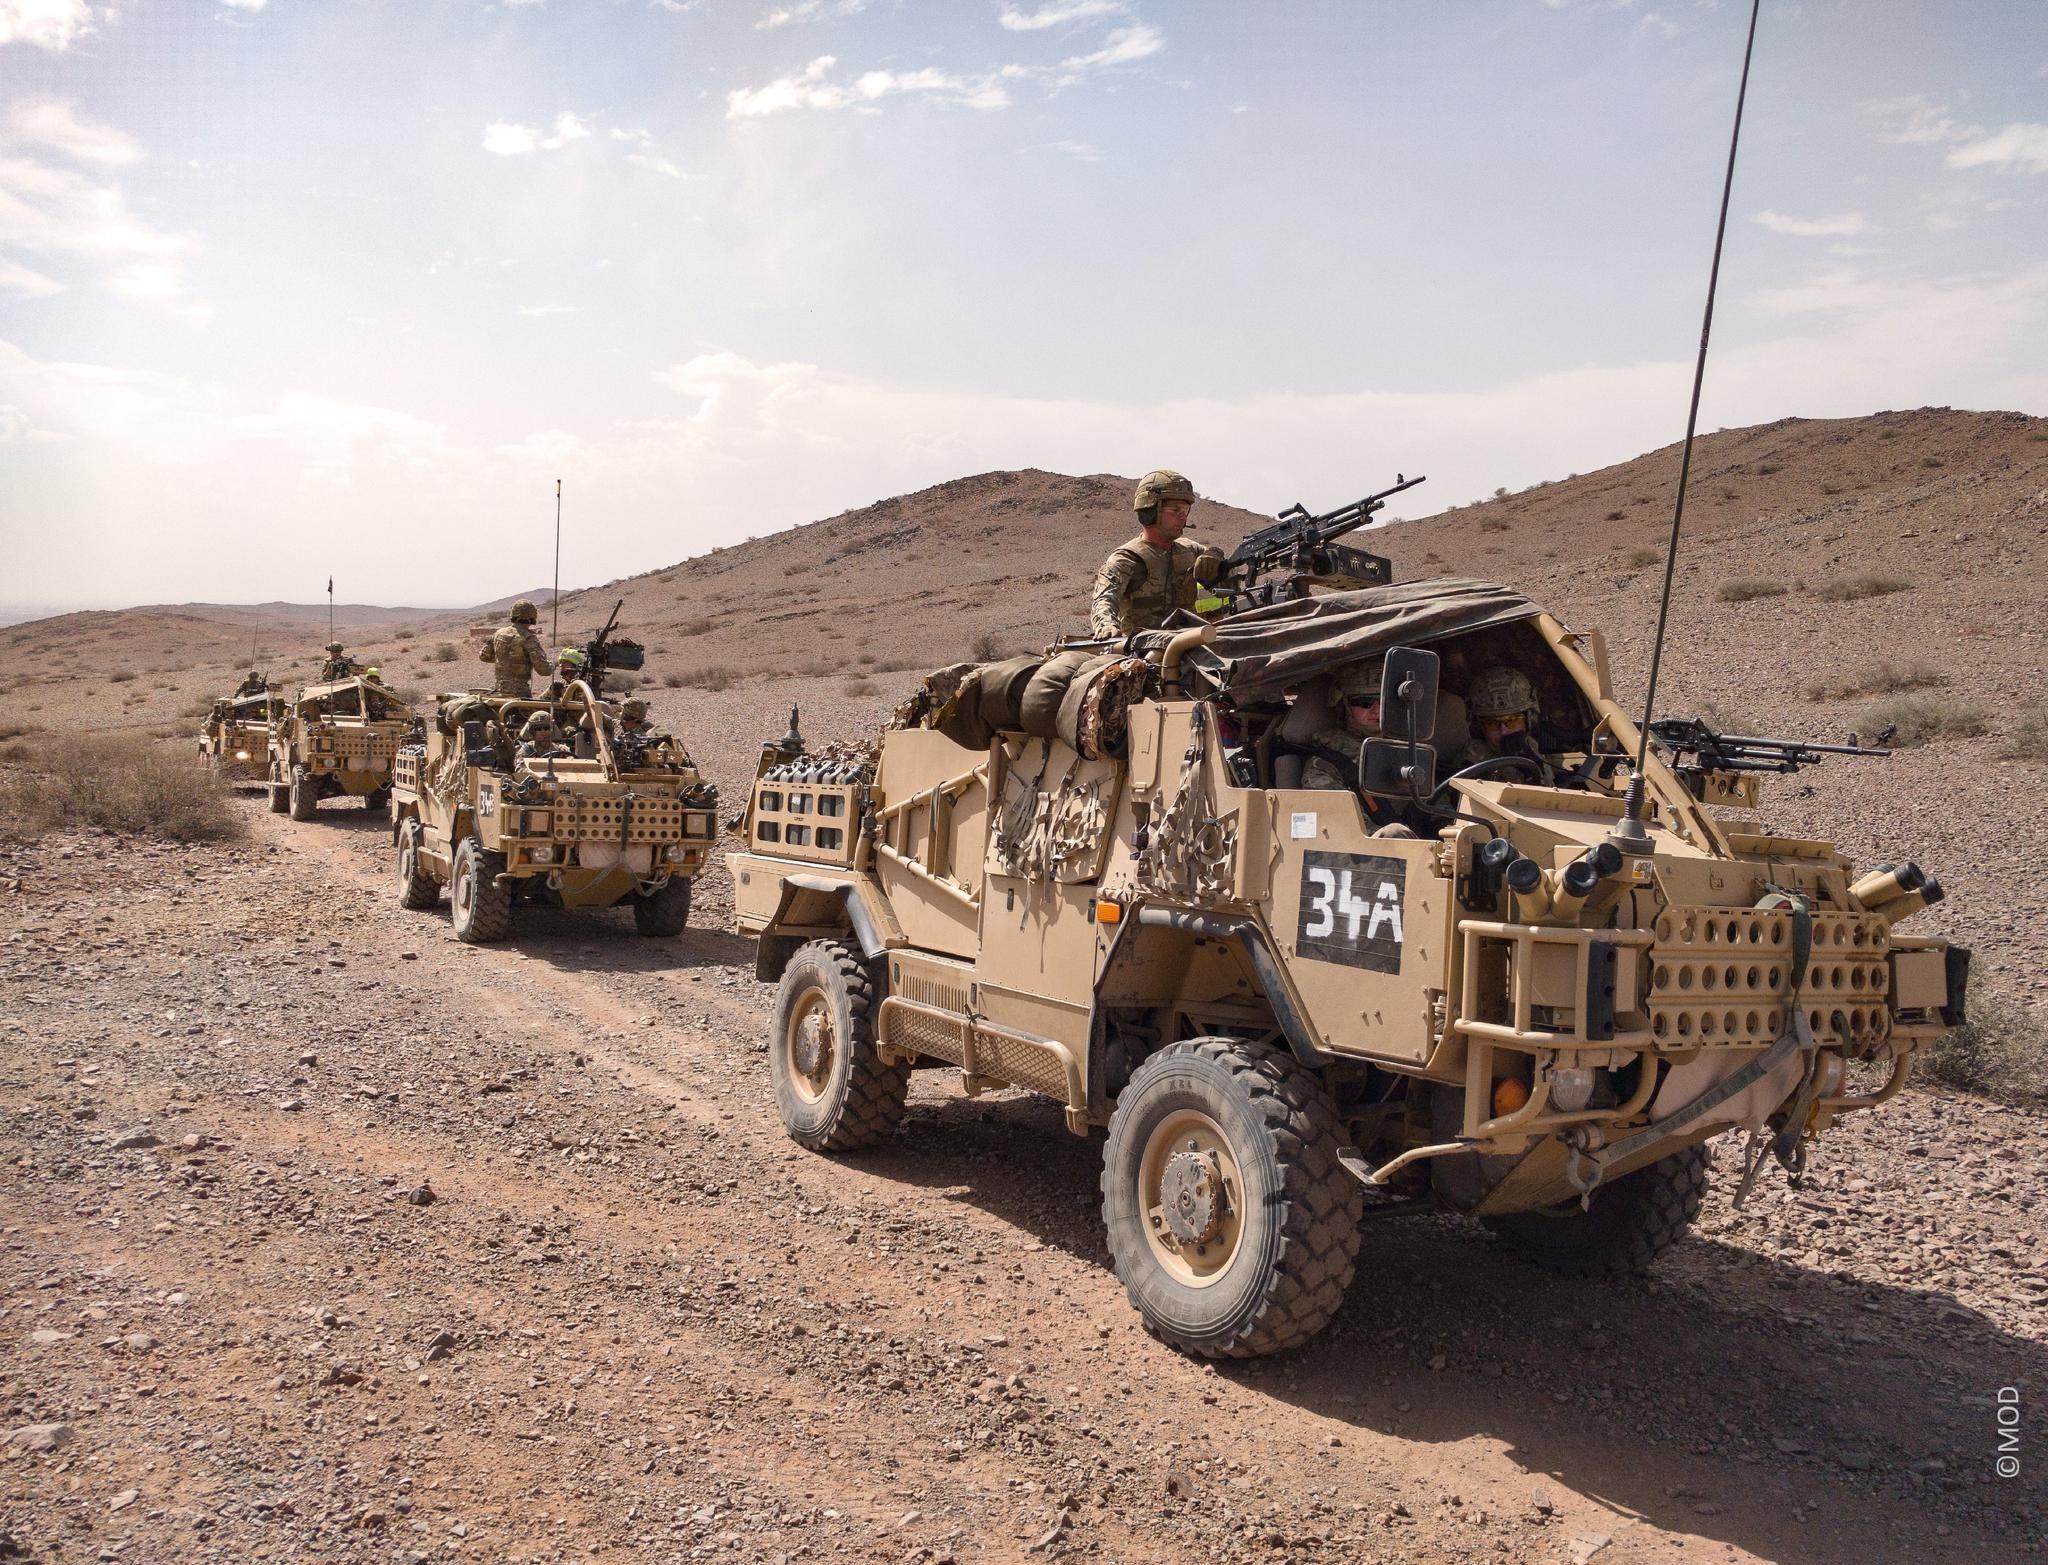 3CDSE tank camouflage desert